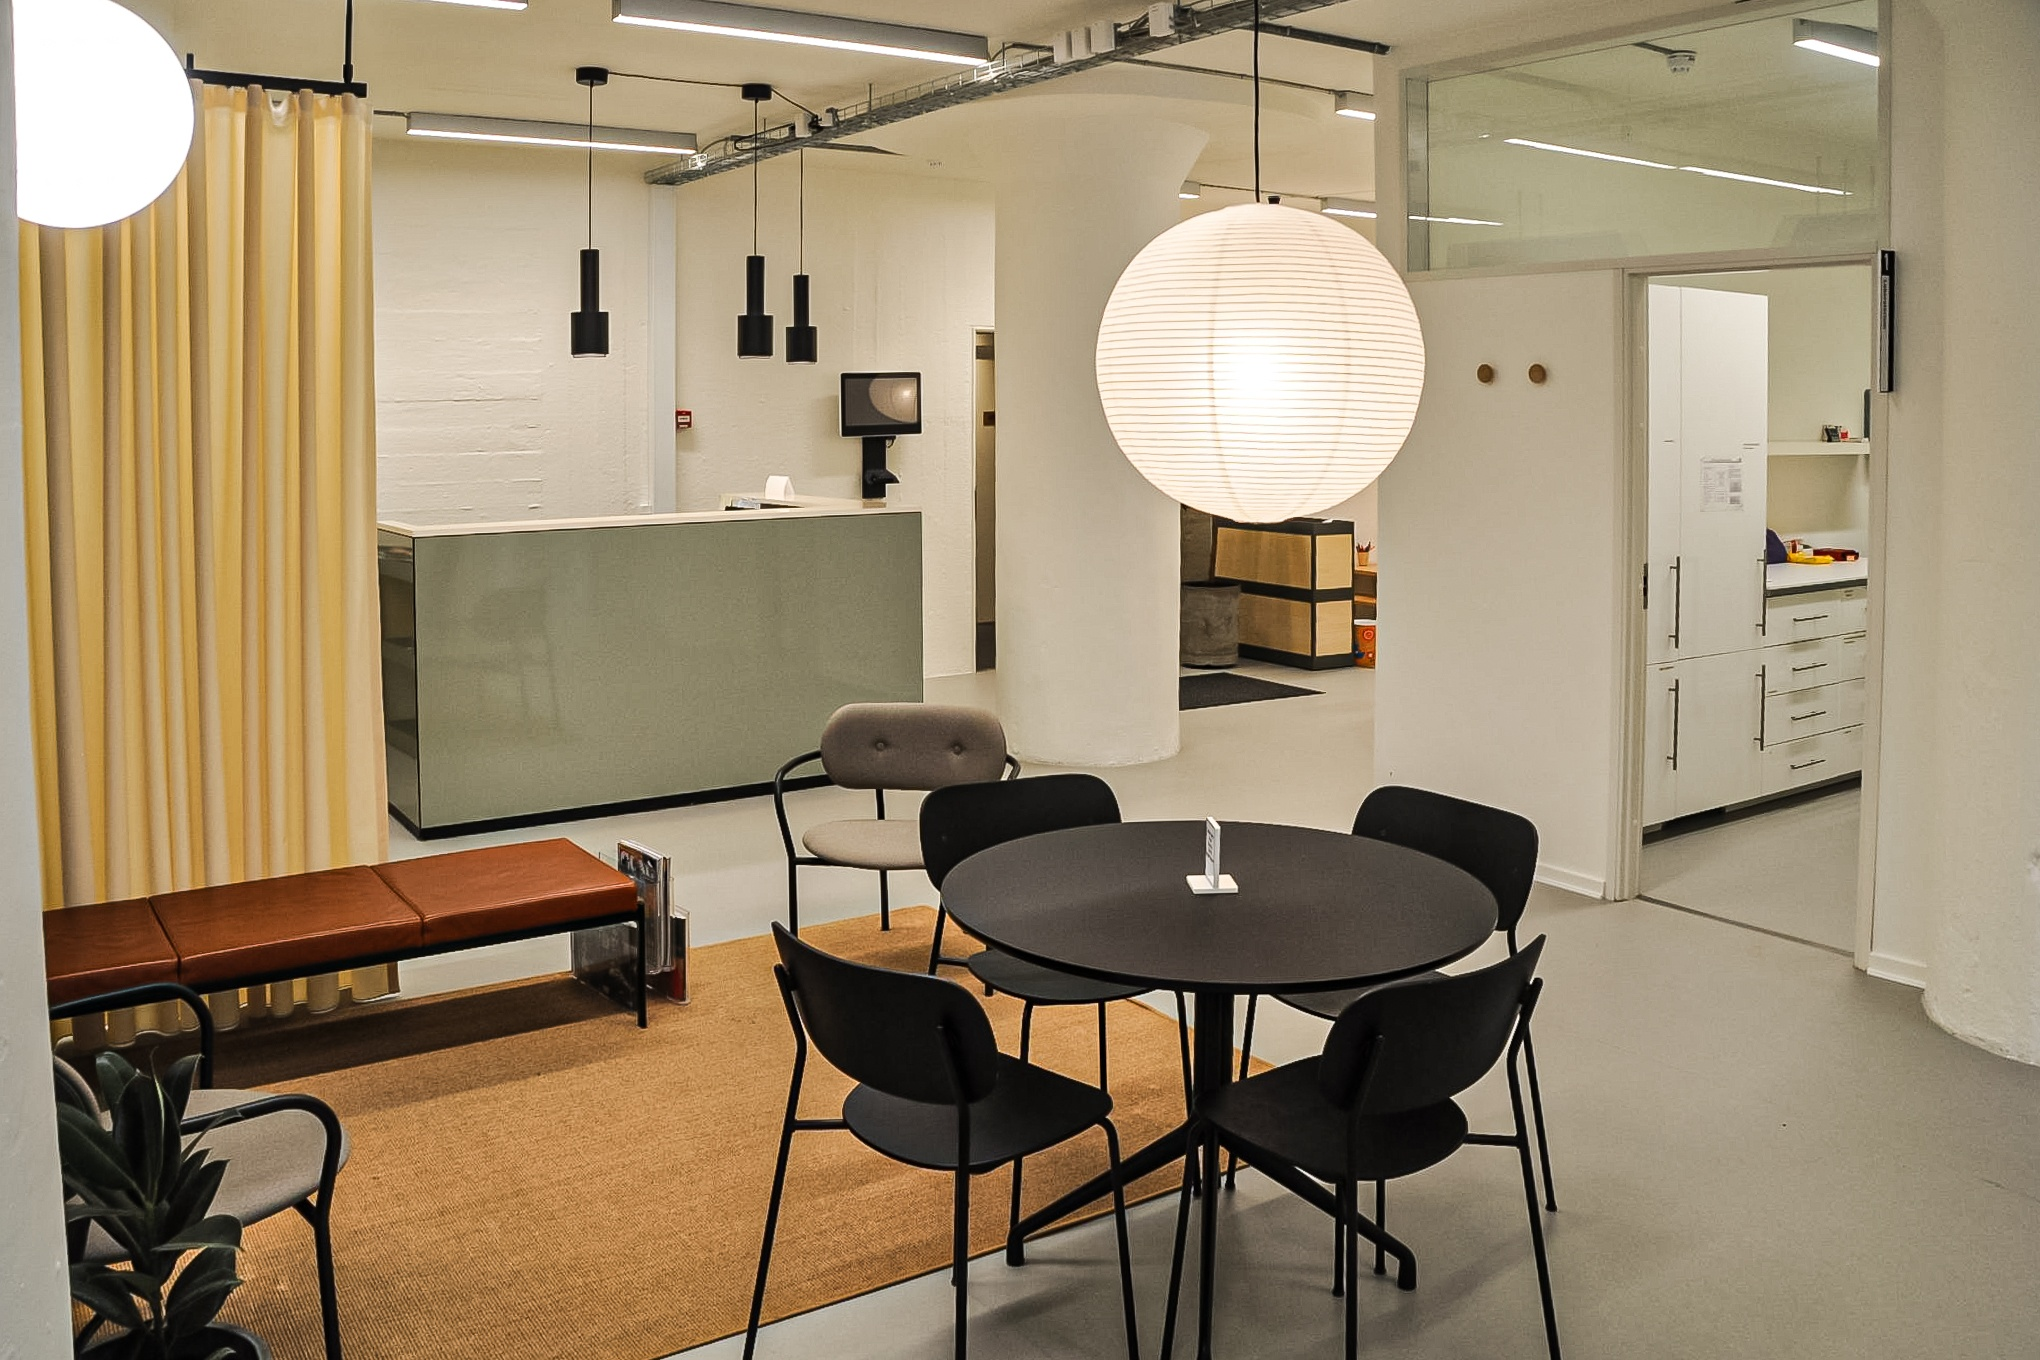 Portræt_Bunn Studio_Klinik_redigeret